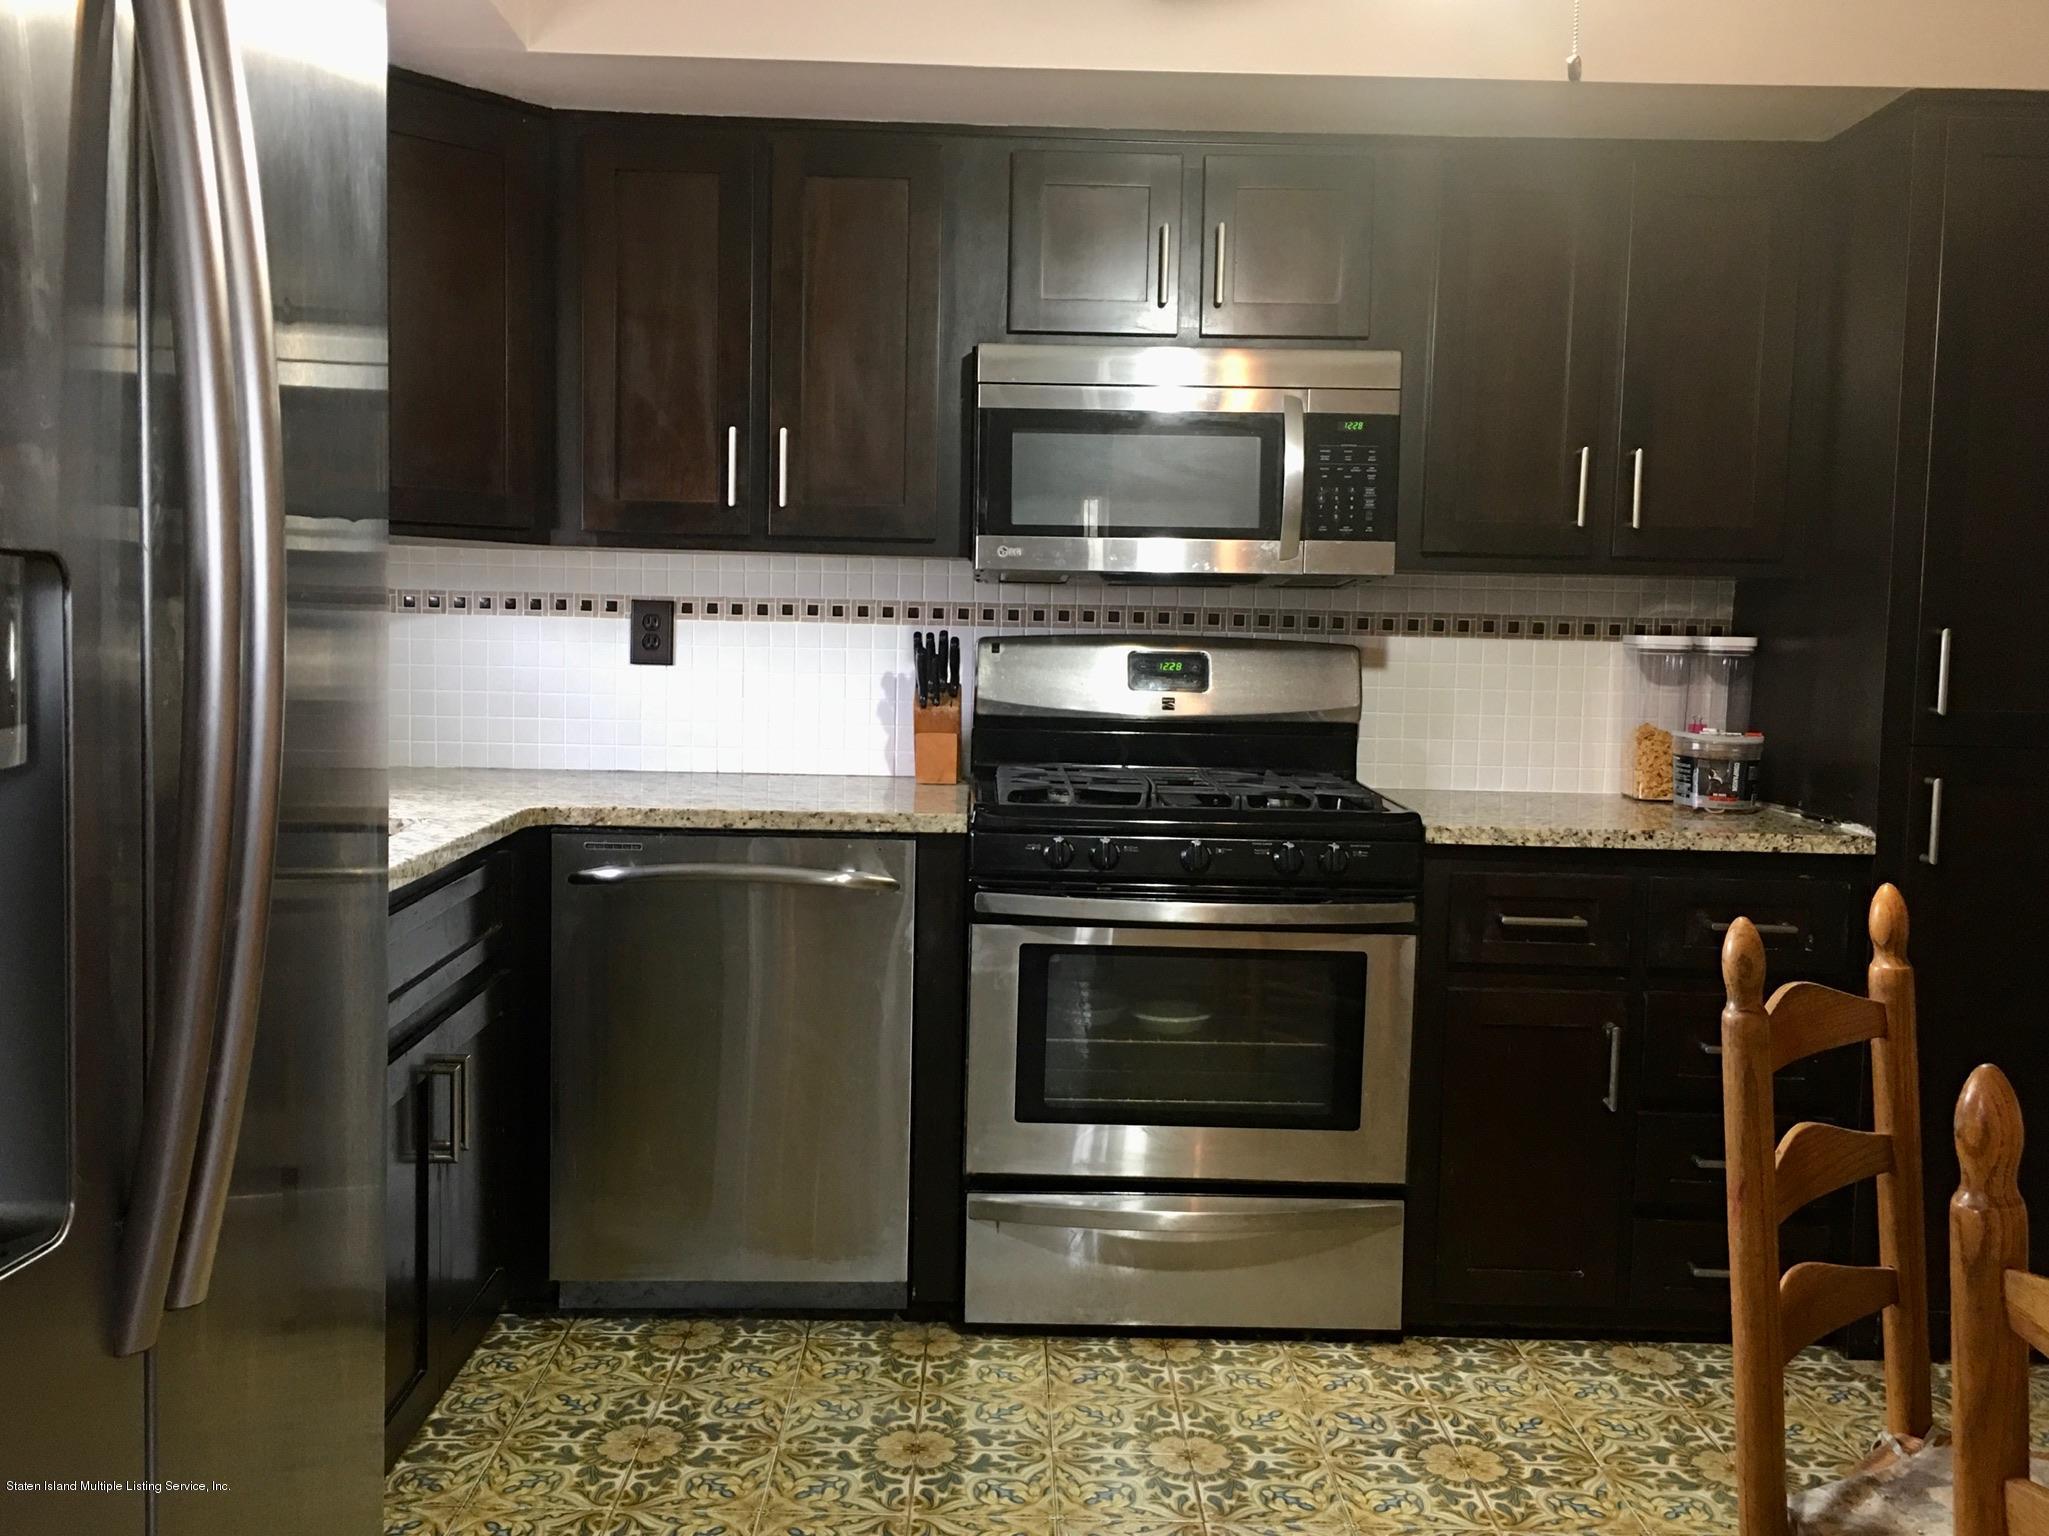 Two Family - Semi-Attached 83 Sunfield Avenue  Staten Island, NY 10312, MLS-1133415-6